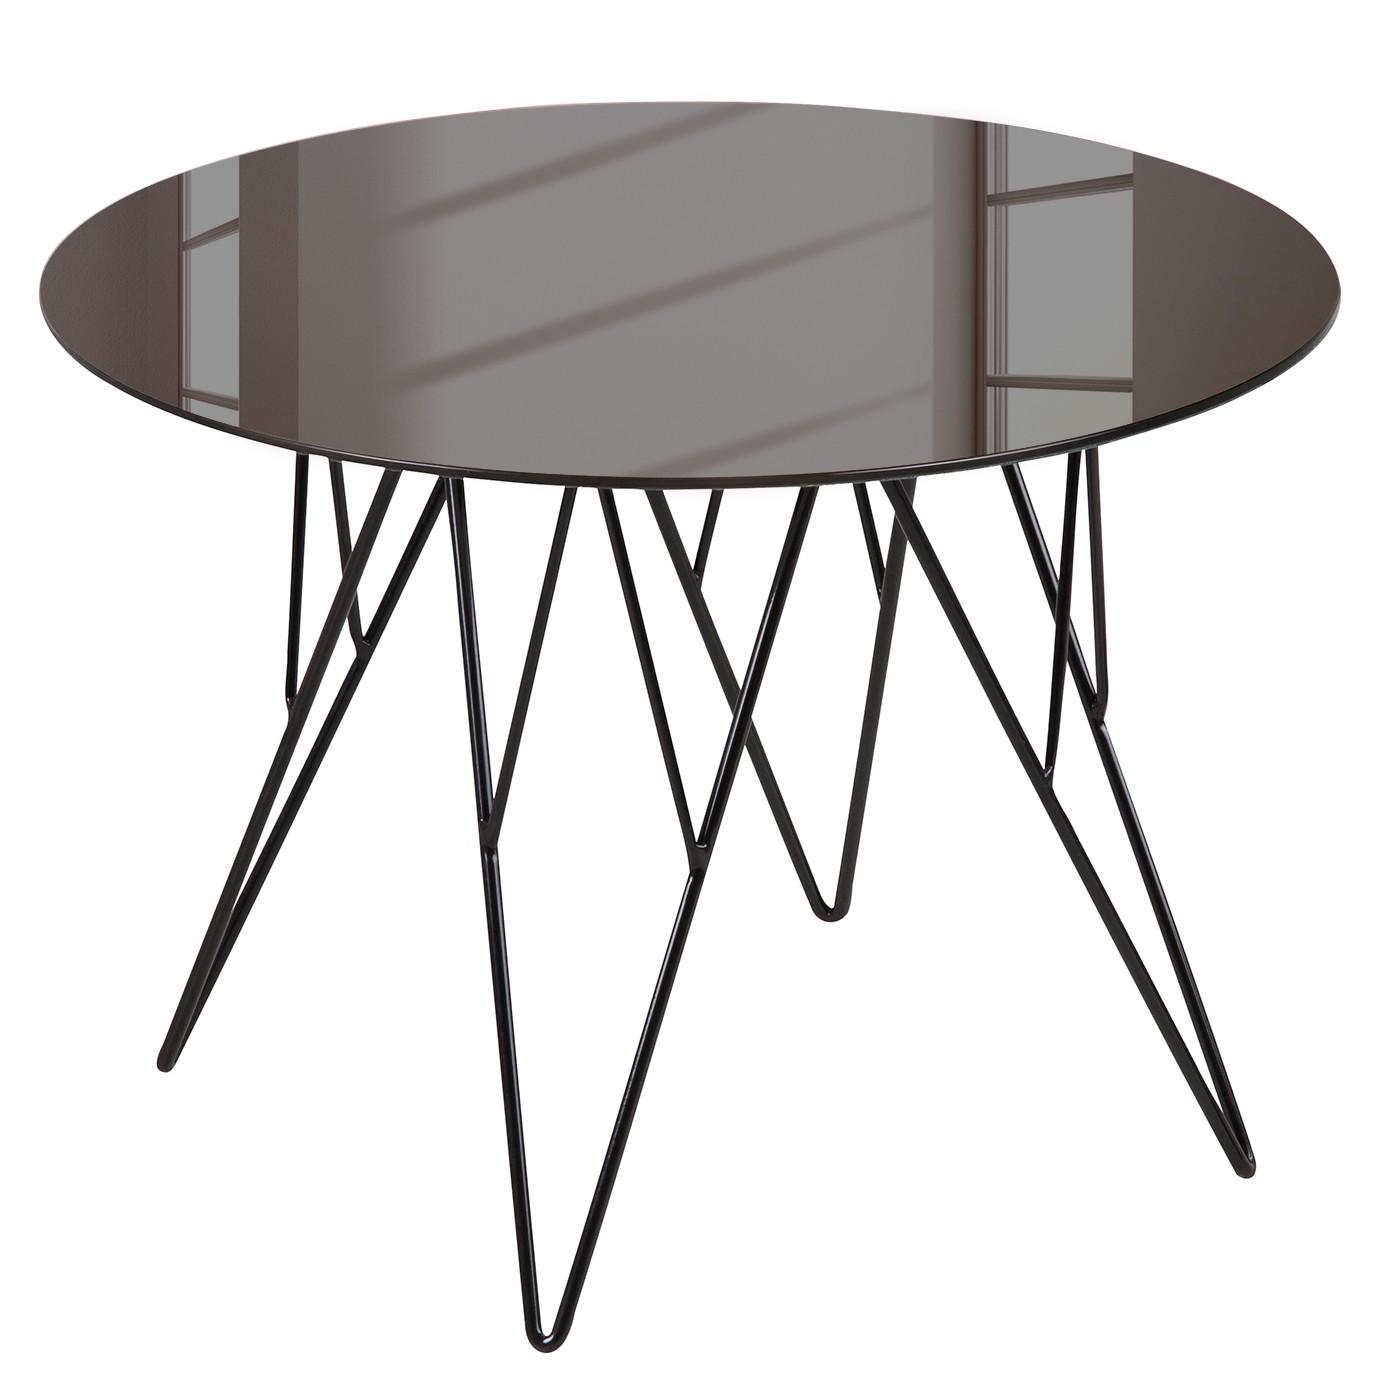 Table basse Kazo - Verre miroir / Métal - Bronze / Noir - 80 x 45 cm, Fredriks